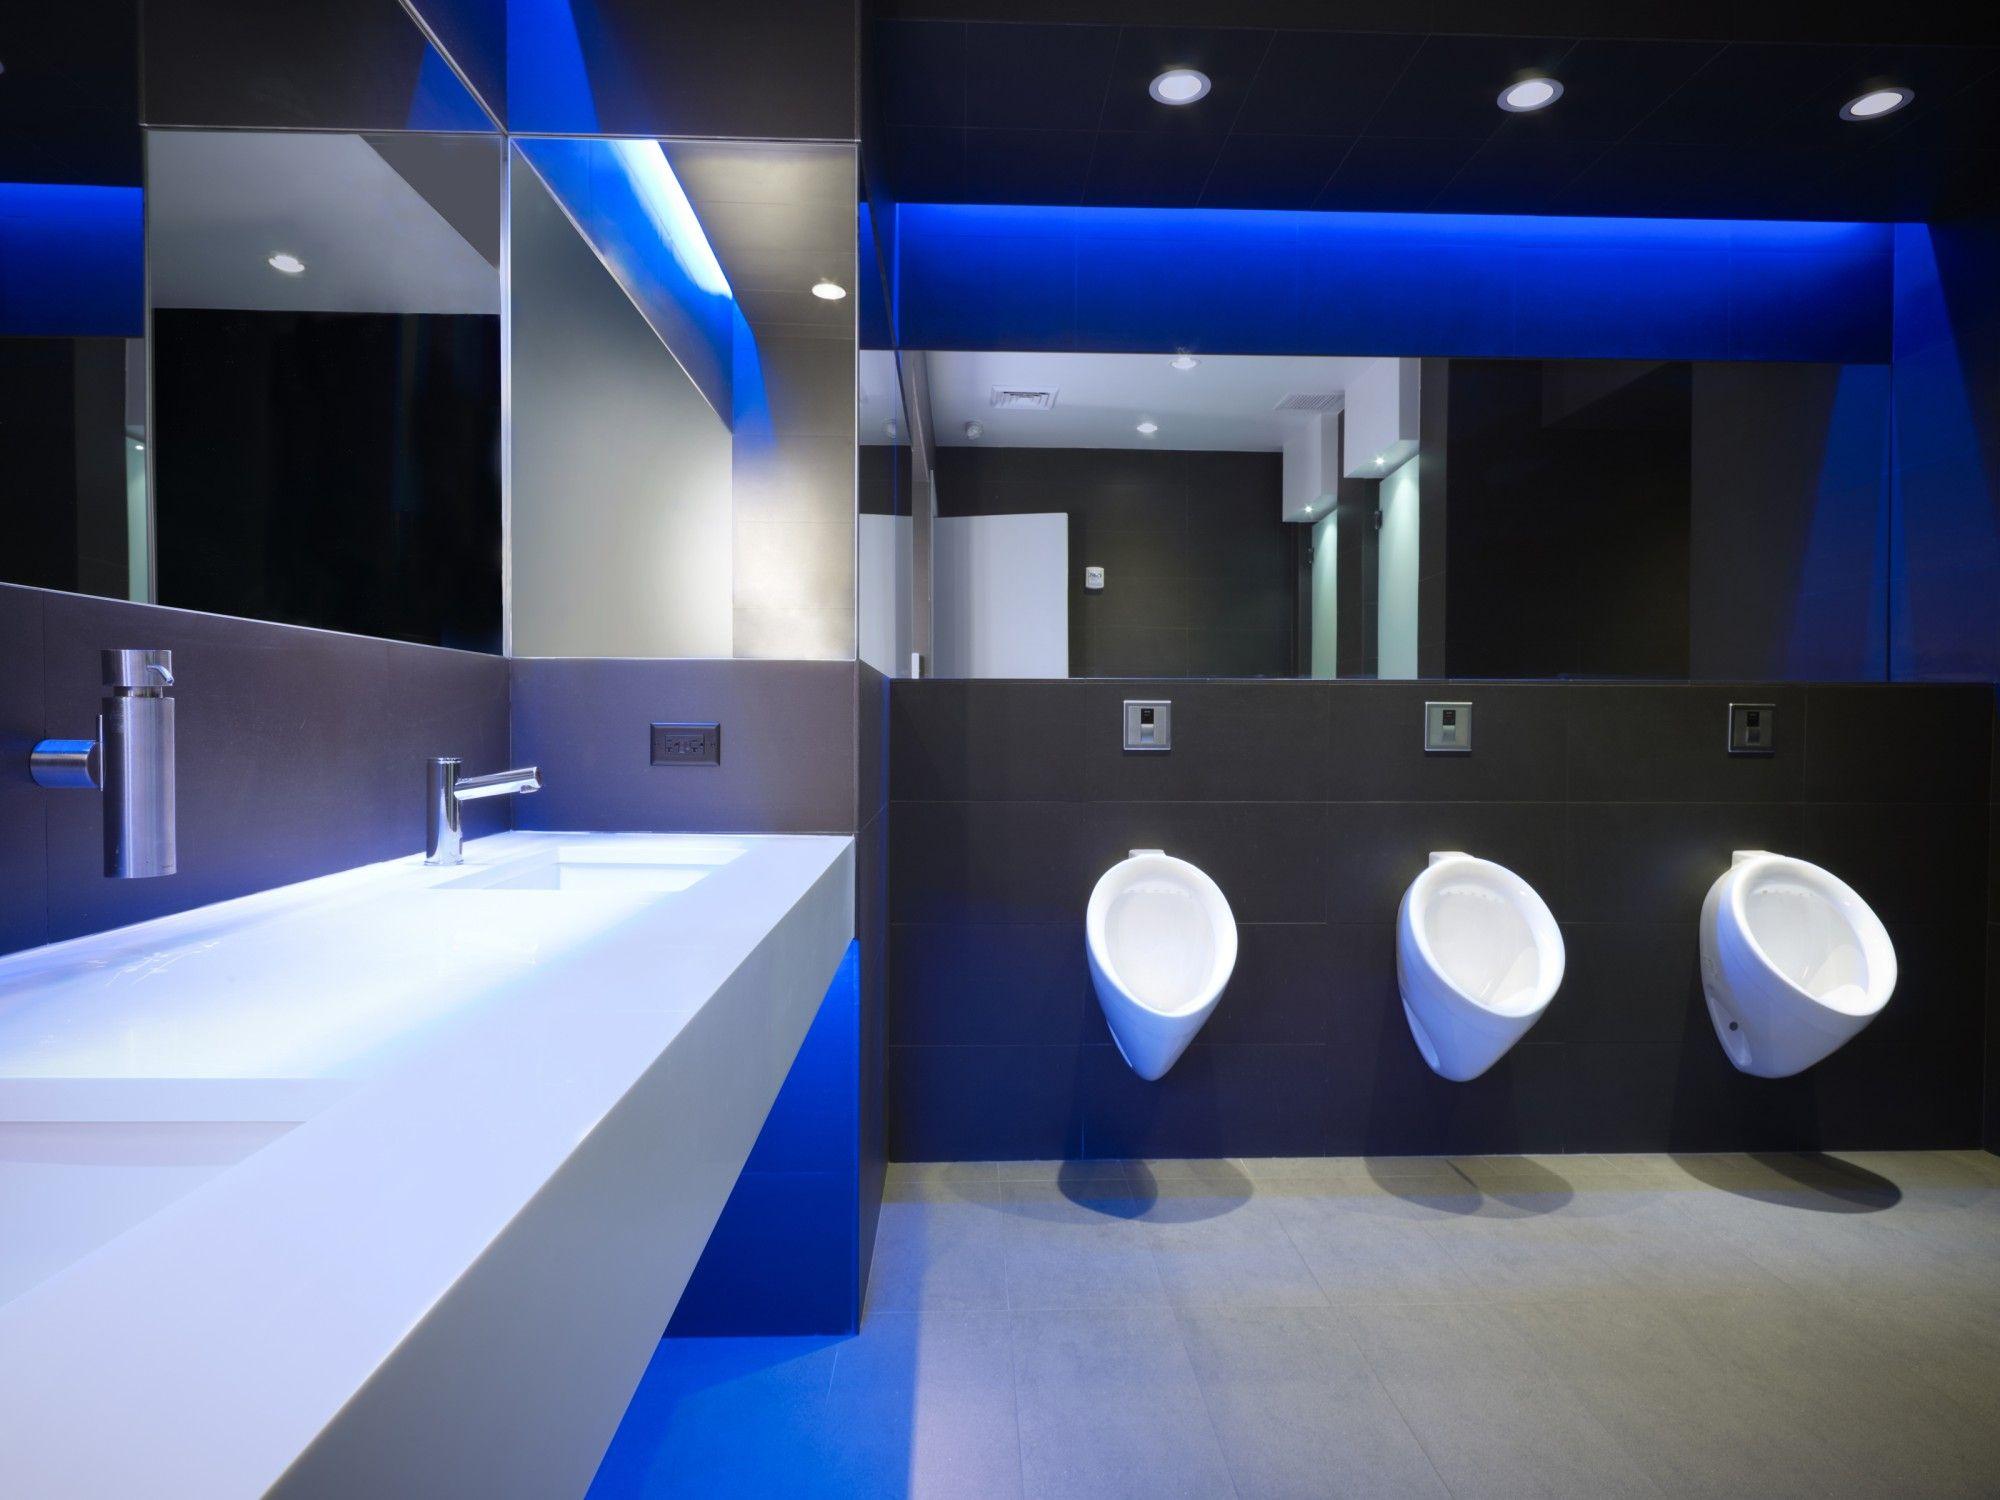 aurora_corporate_bathroom2.jpg